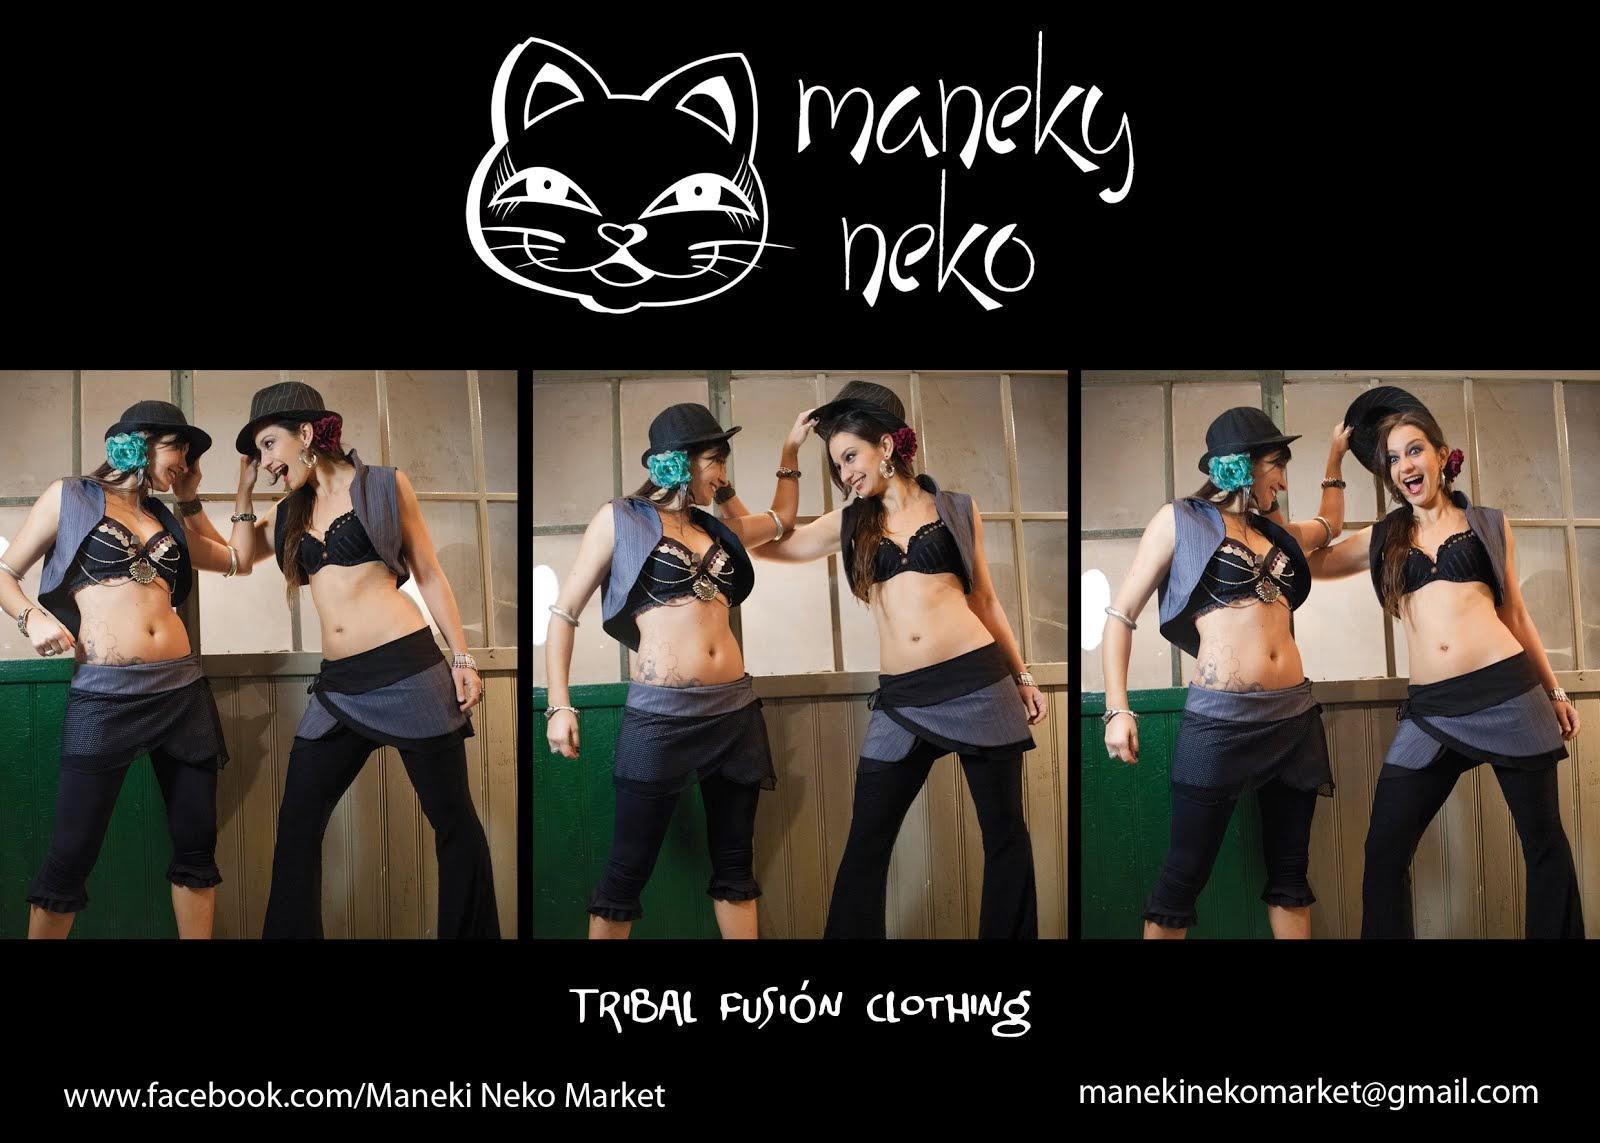 Maneki Neko Tribal Clothing